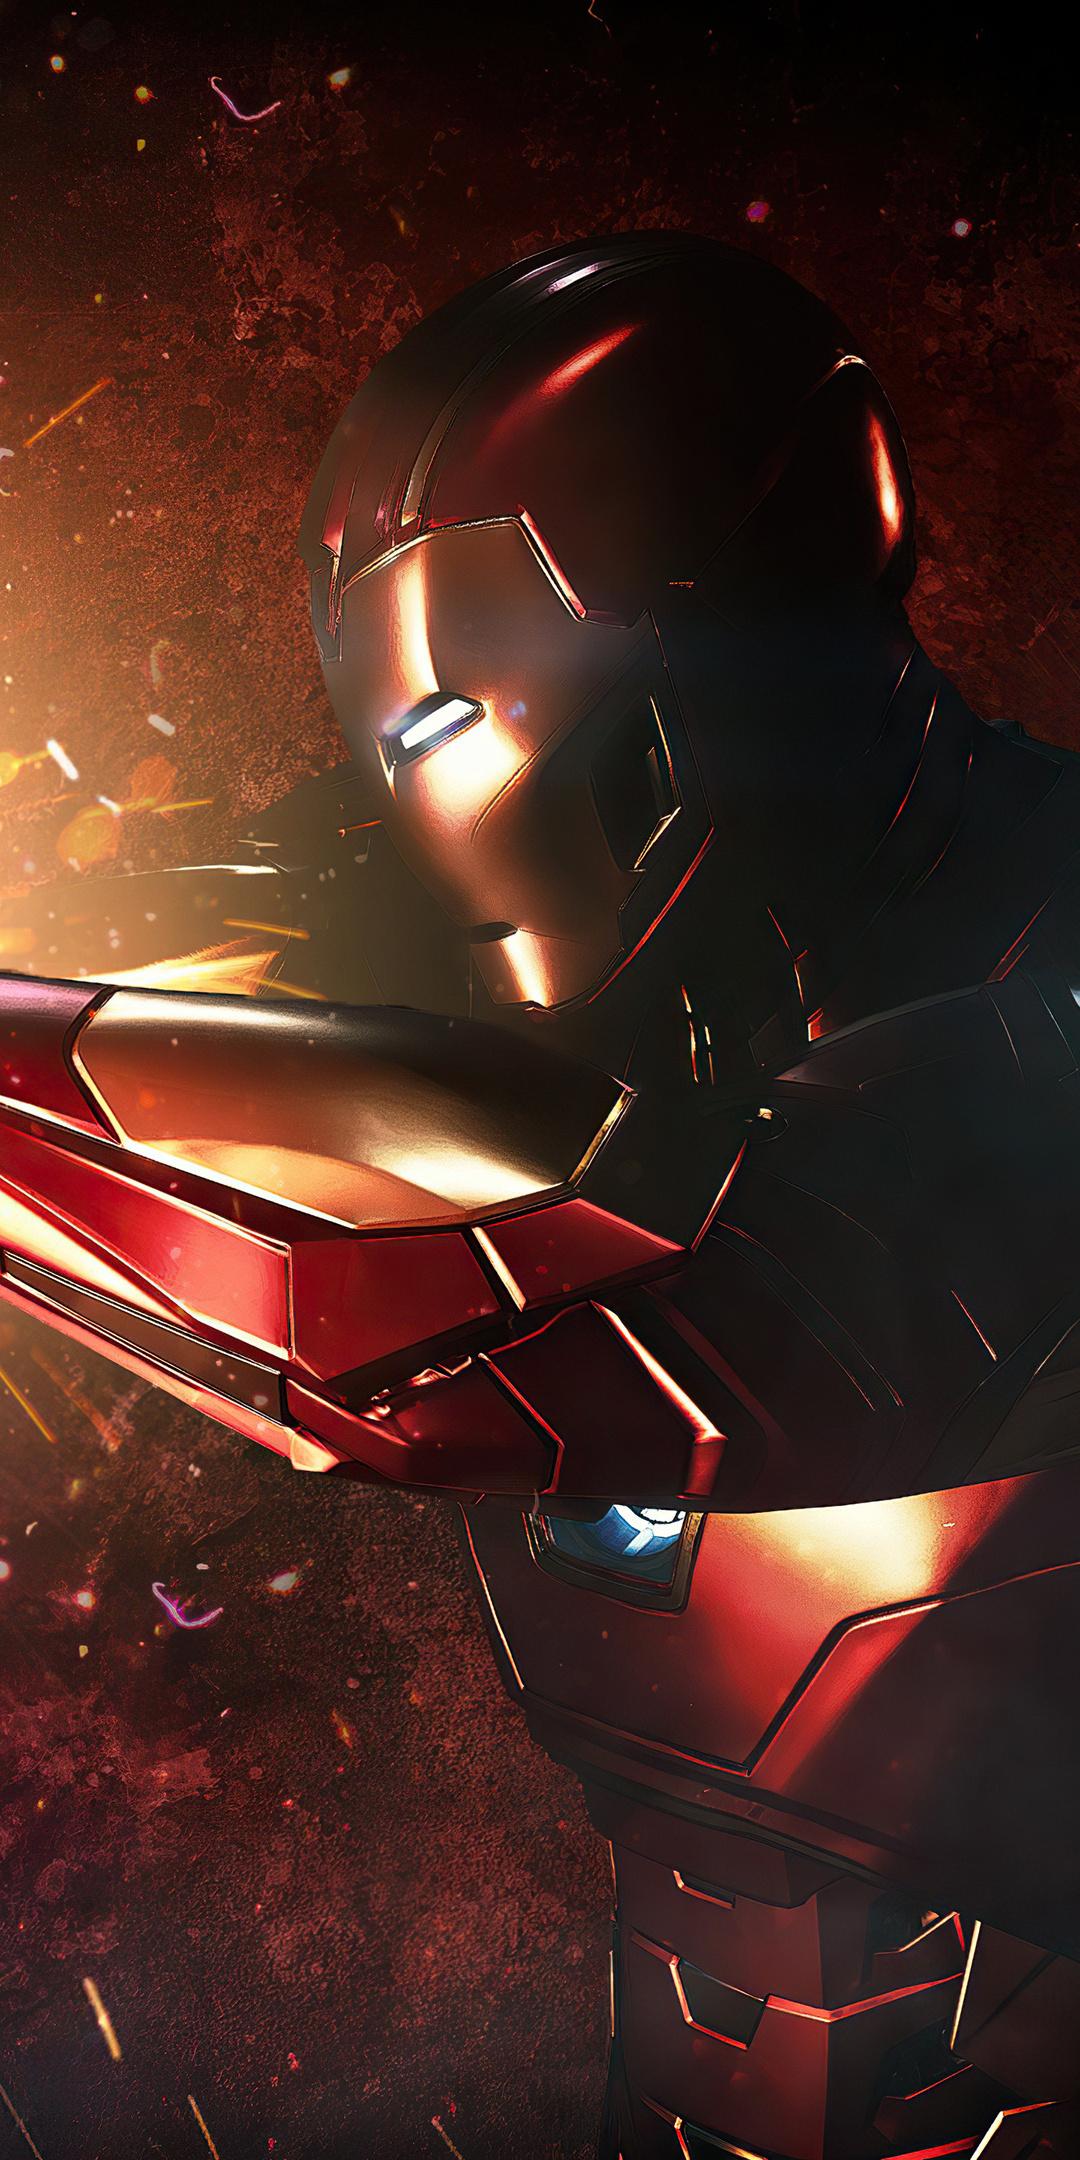 captain-america-vs-iron-man-fight-4k-6a.jpg